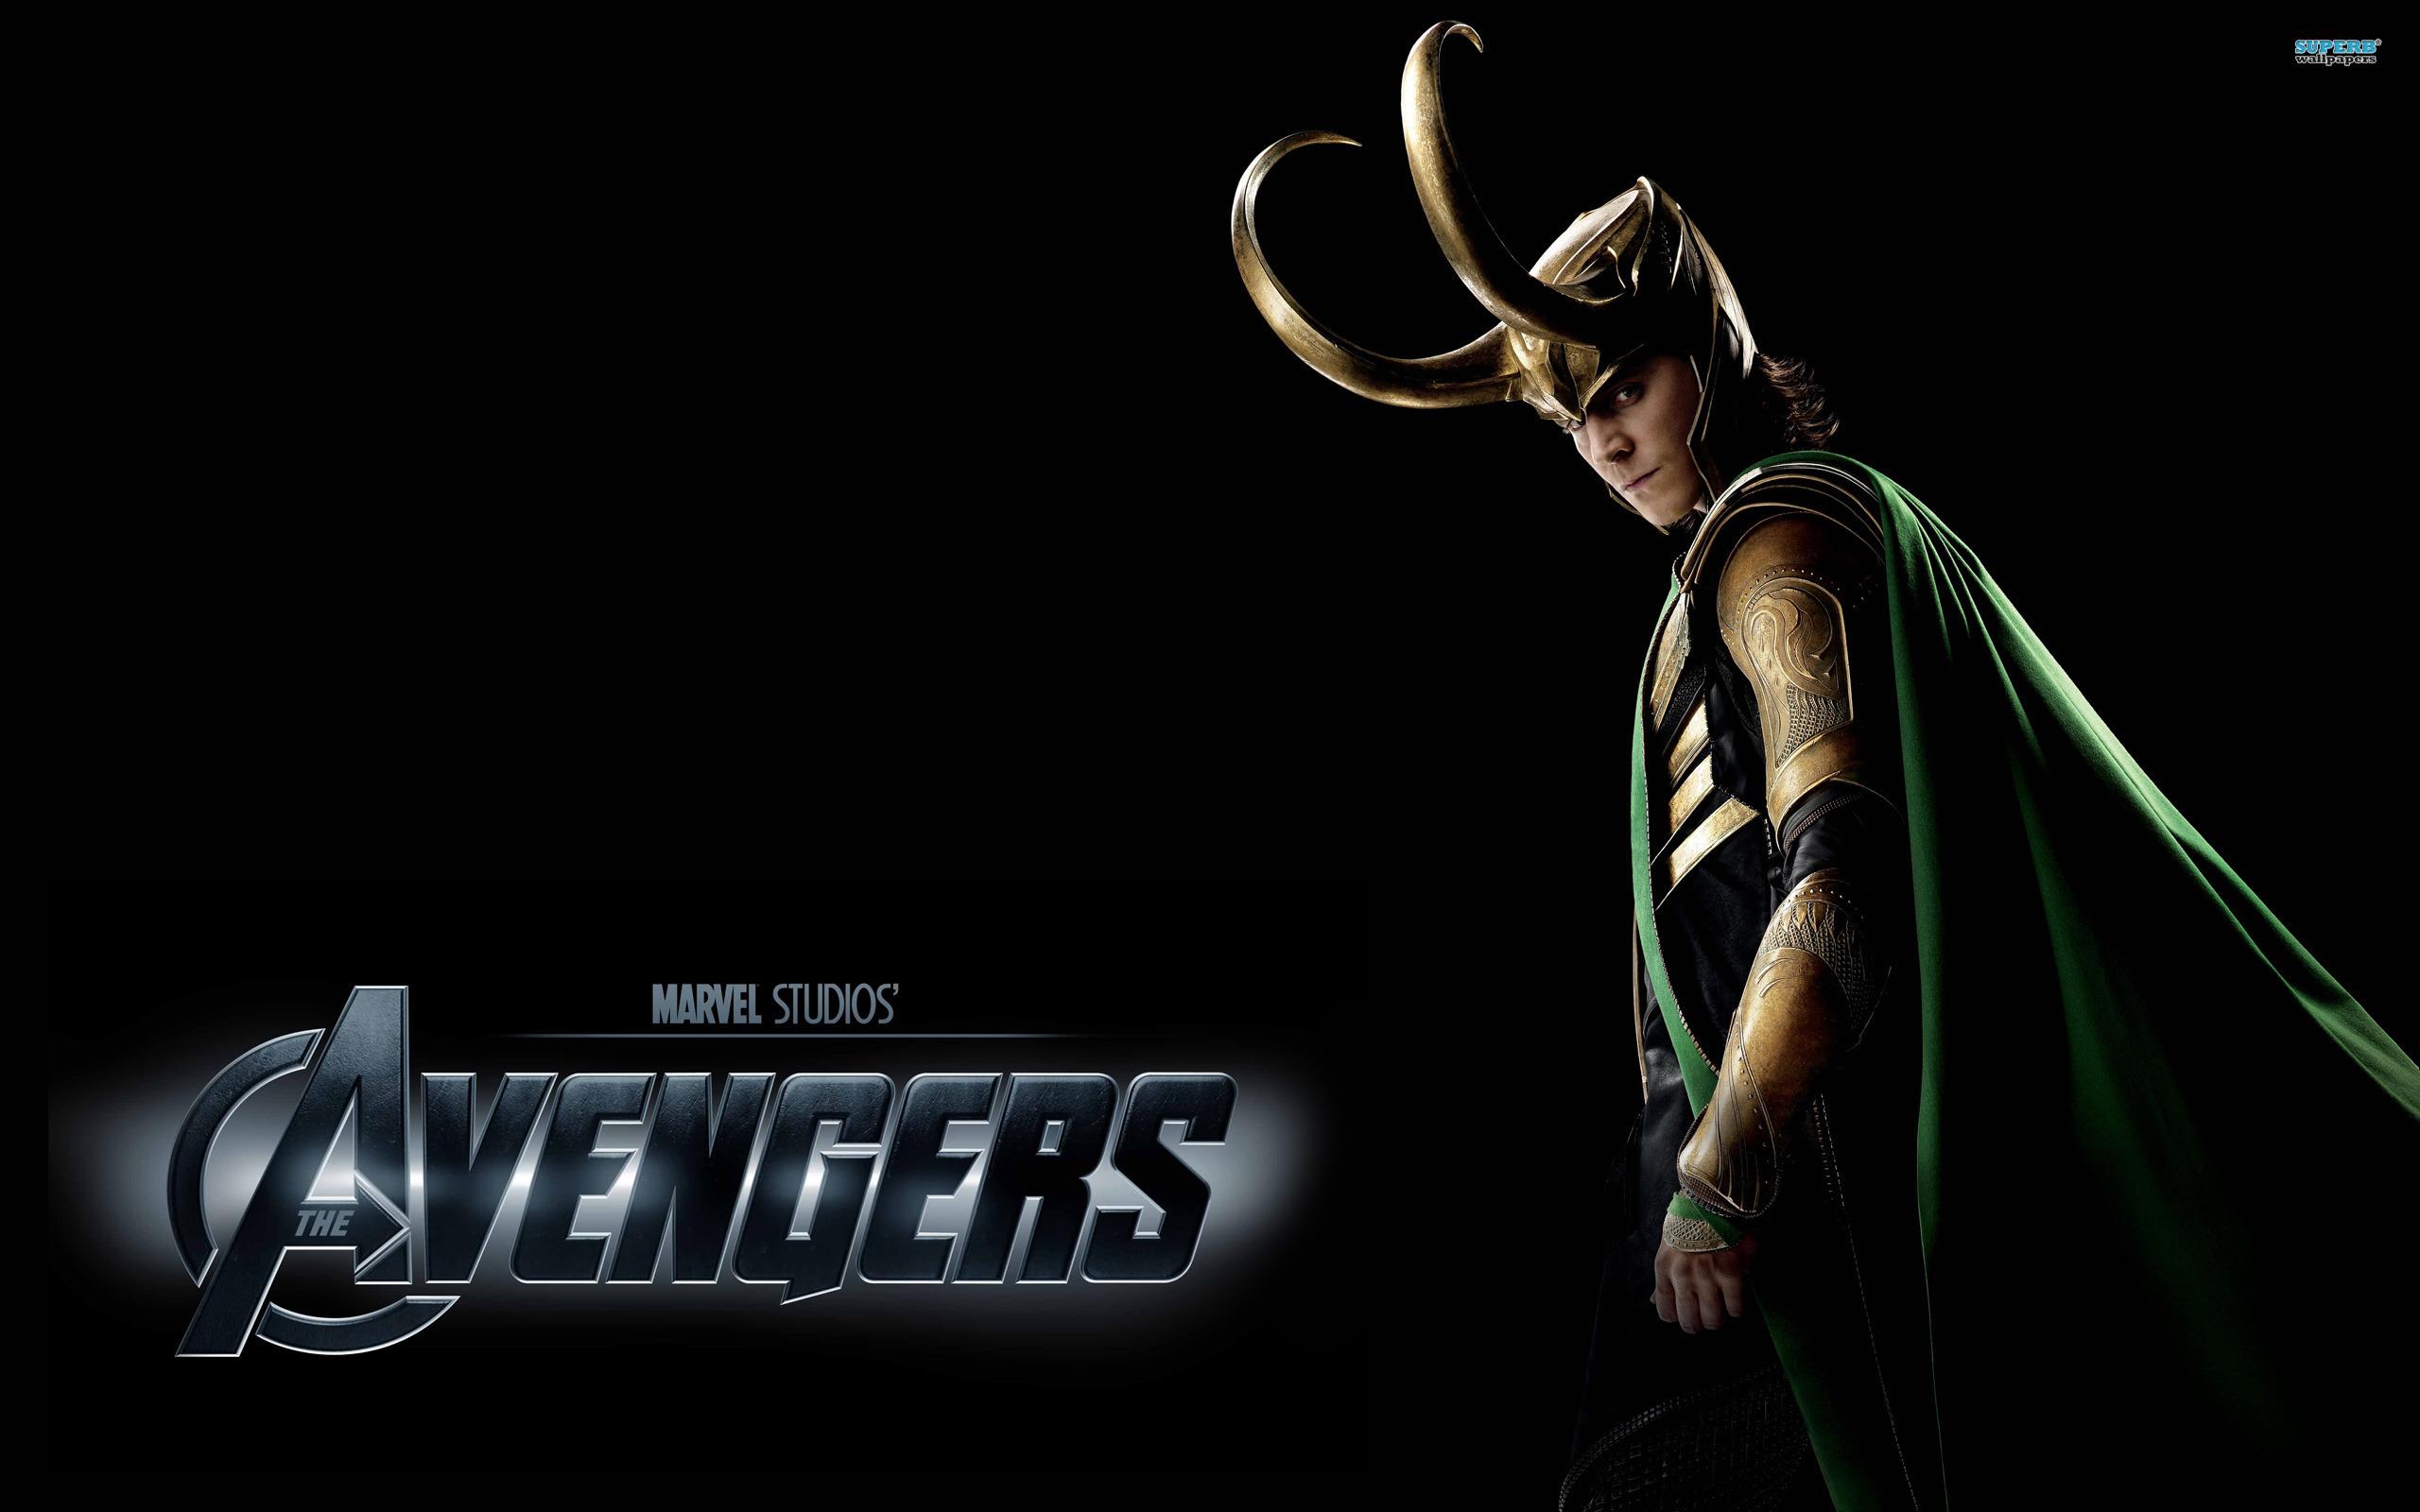 The Avengers Villain Loki HD Wallpapers [Avengers Character Wallpapers 2560x1600